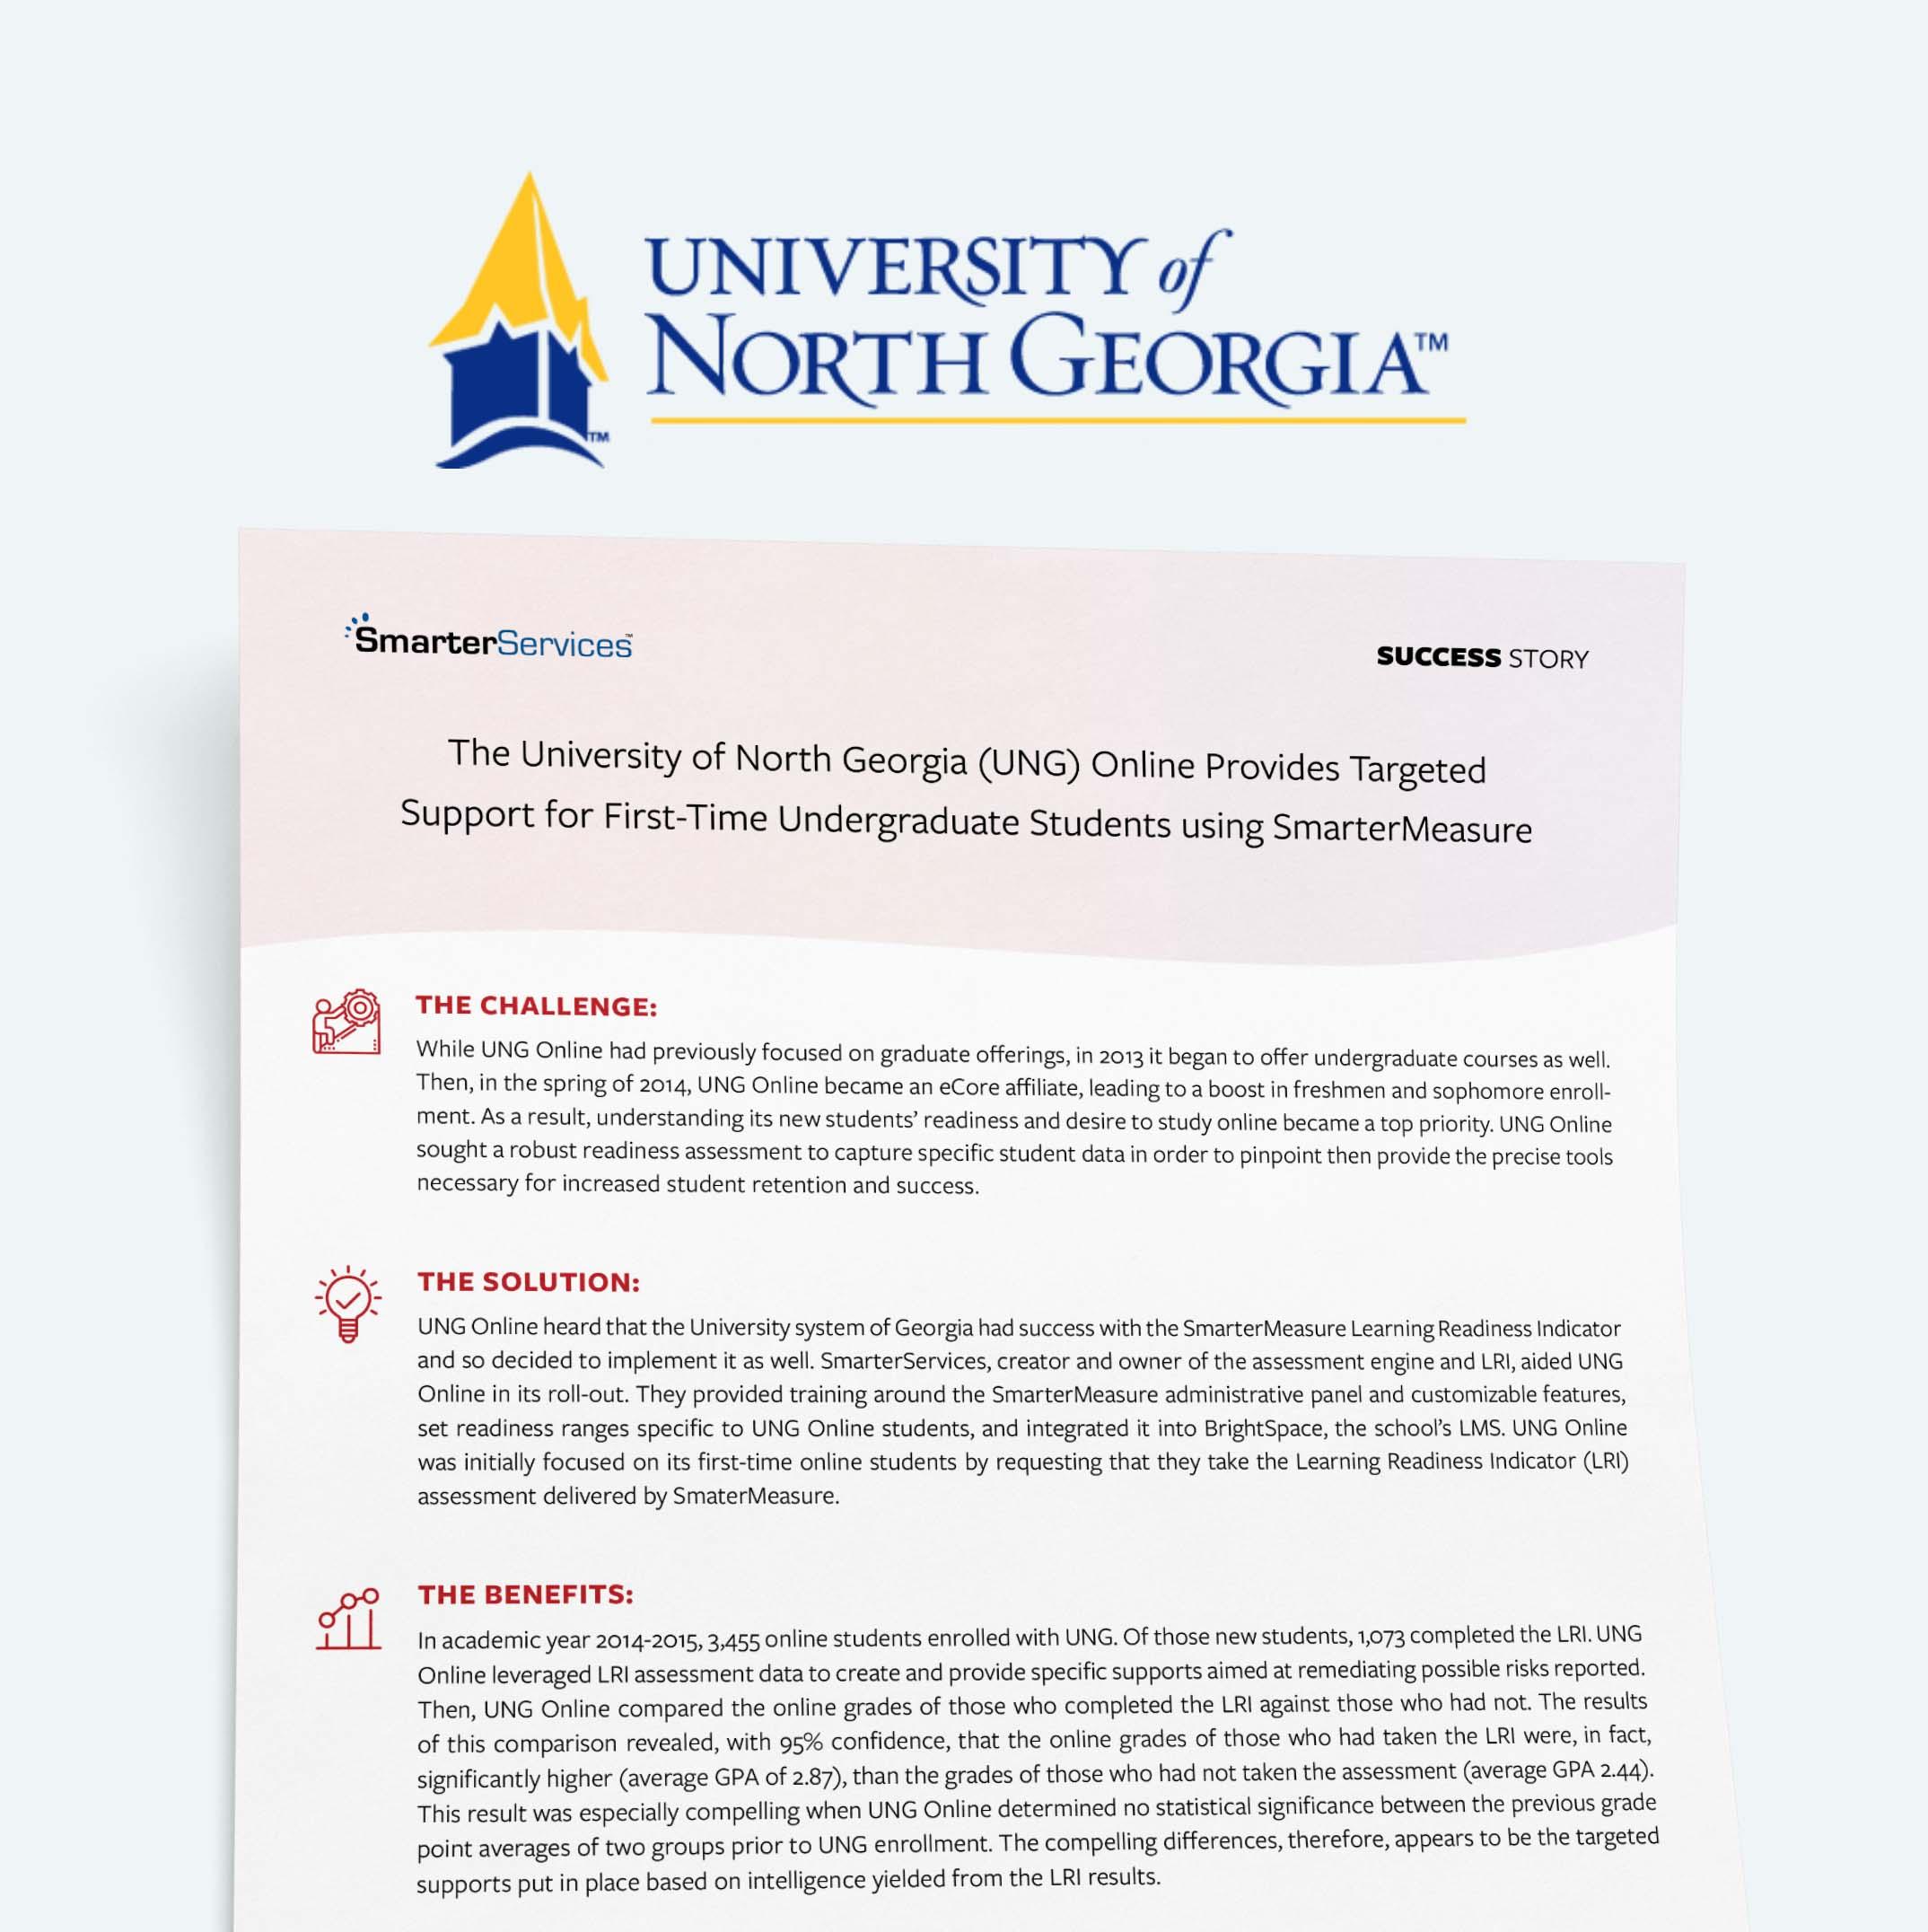 University of North Georgia SmarterMeasure Case Study